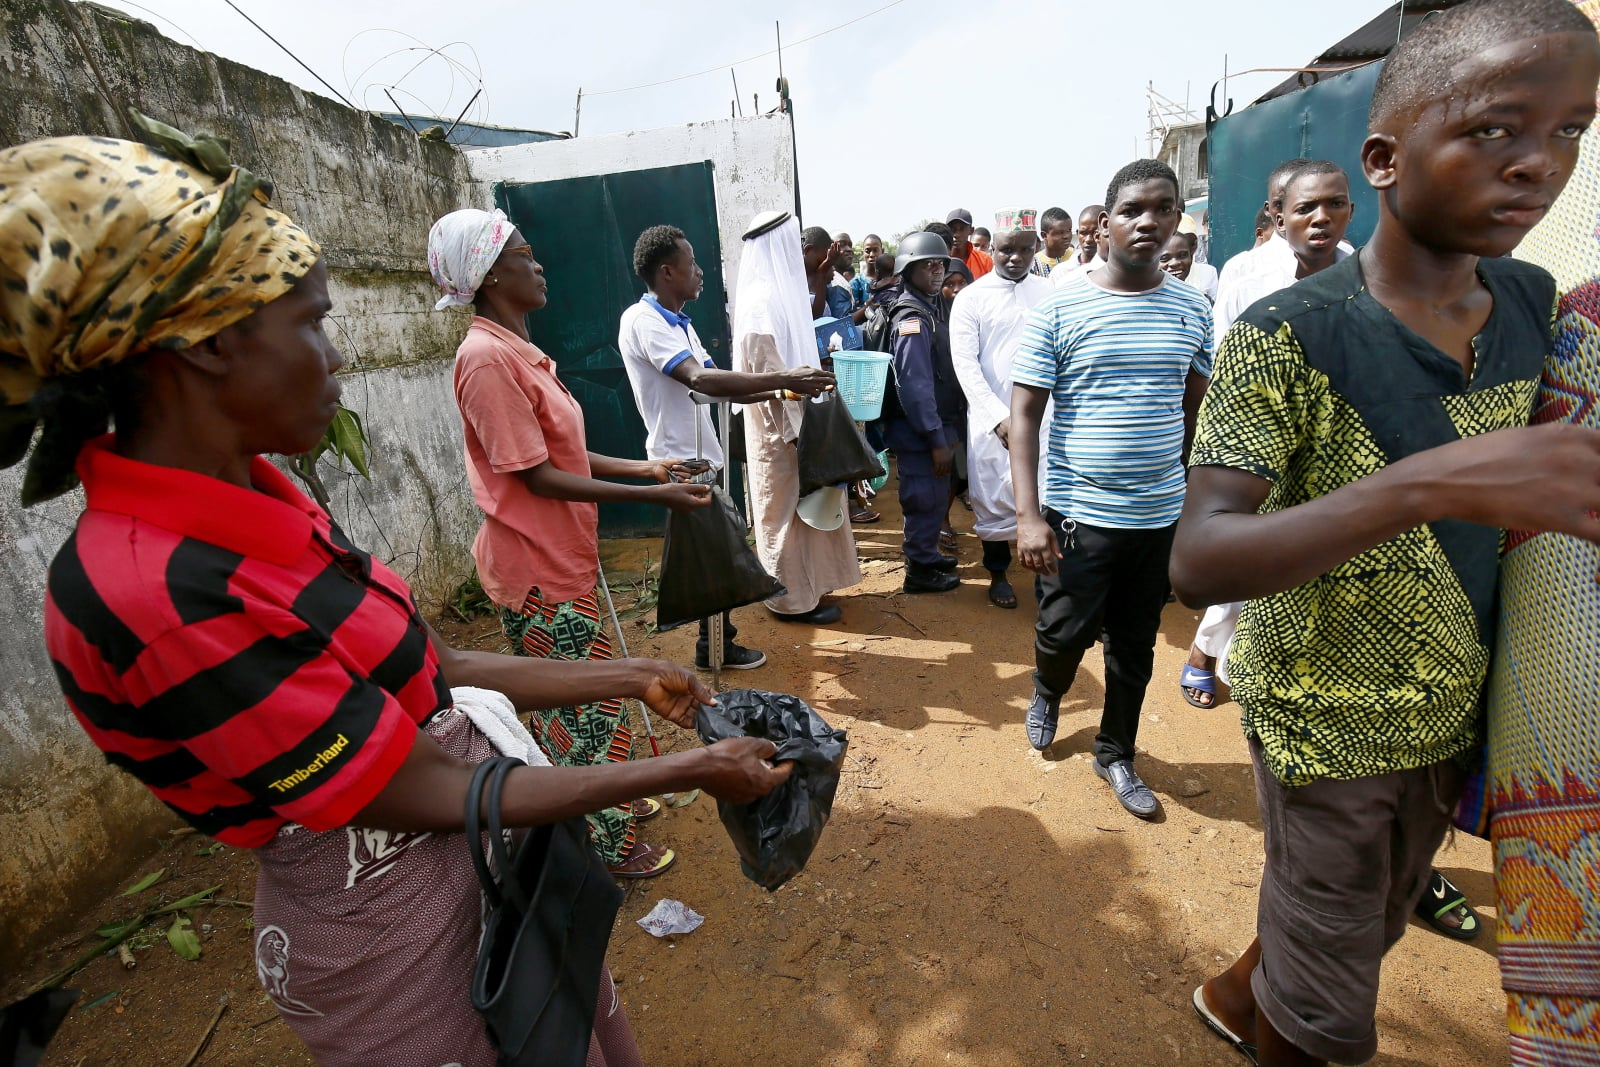 Ramadan w Liberii fot. EPA/AHMED JALLANZO Dostawca: PAP/EPA.